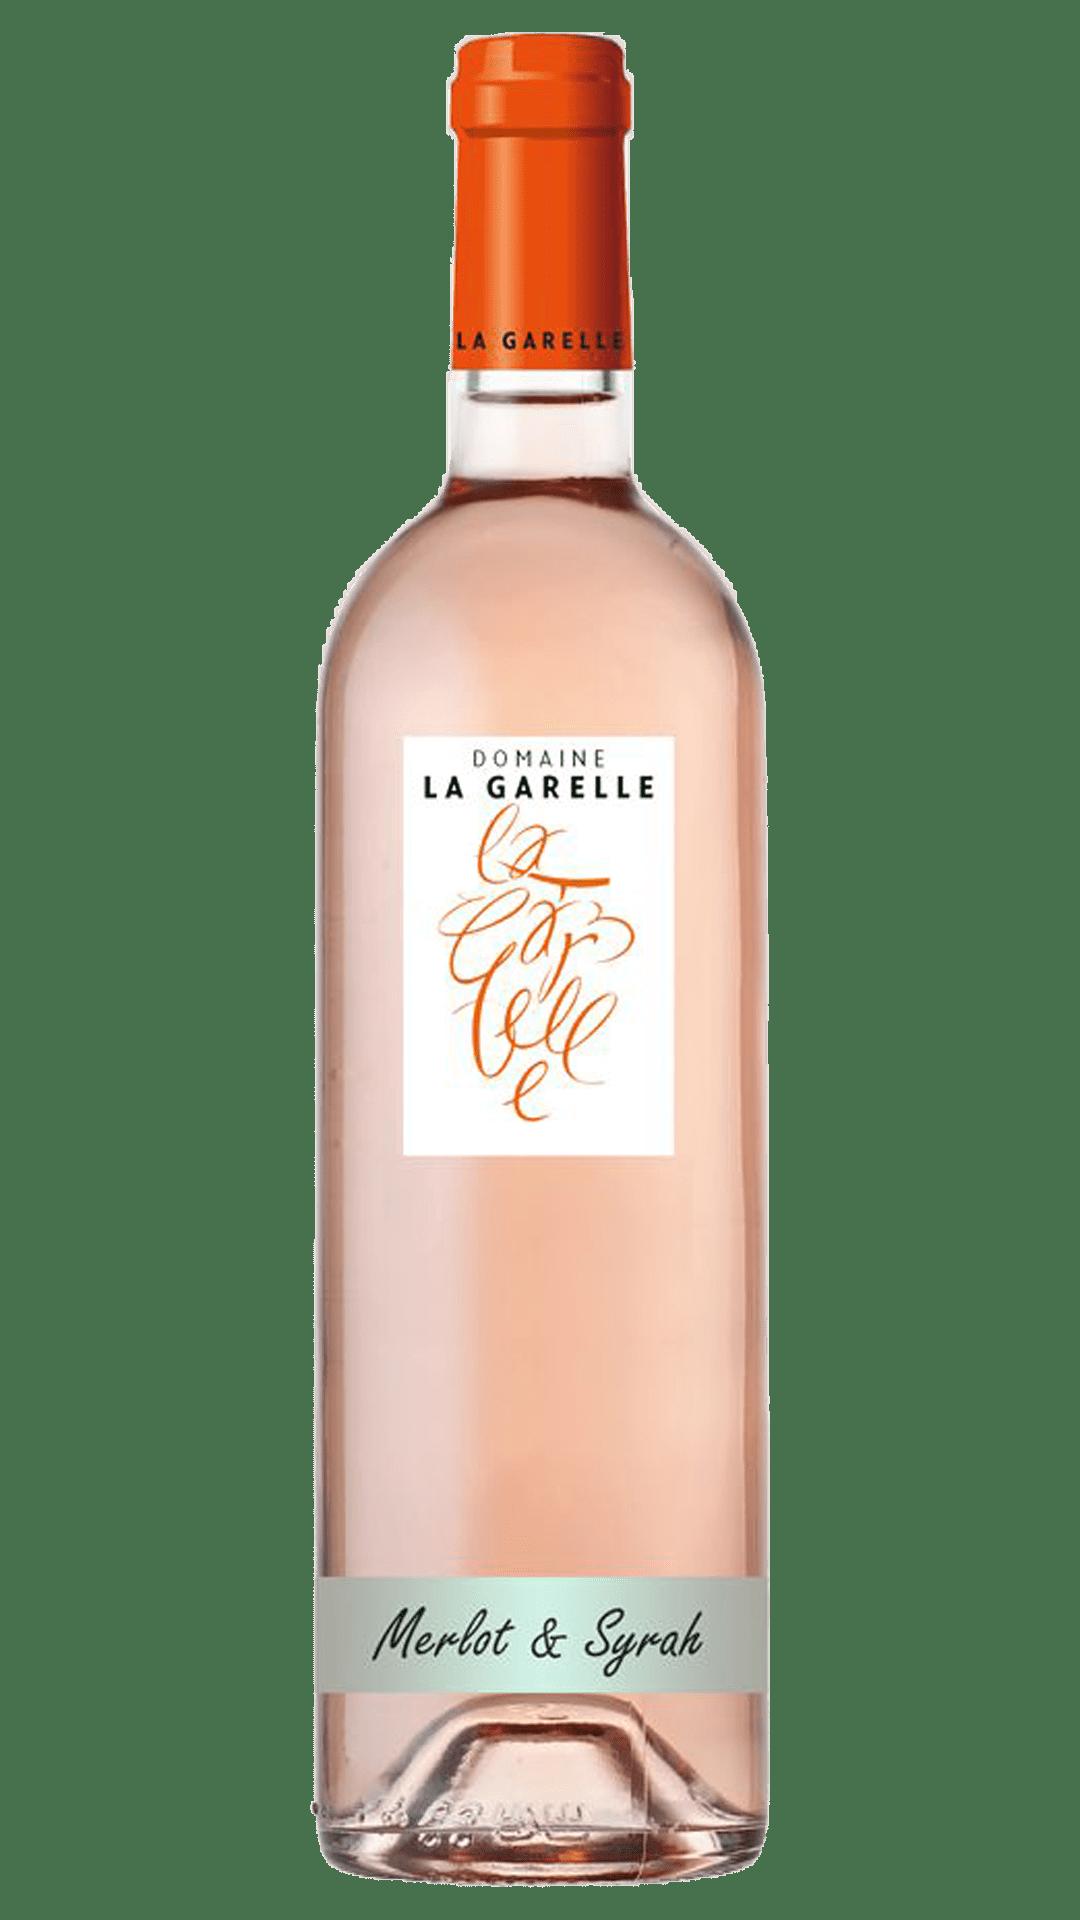 Domaine-La-Garelle-Merlot-Syrah-2019